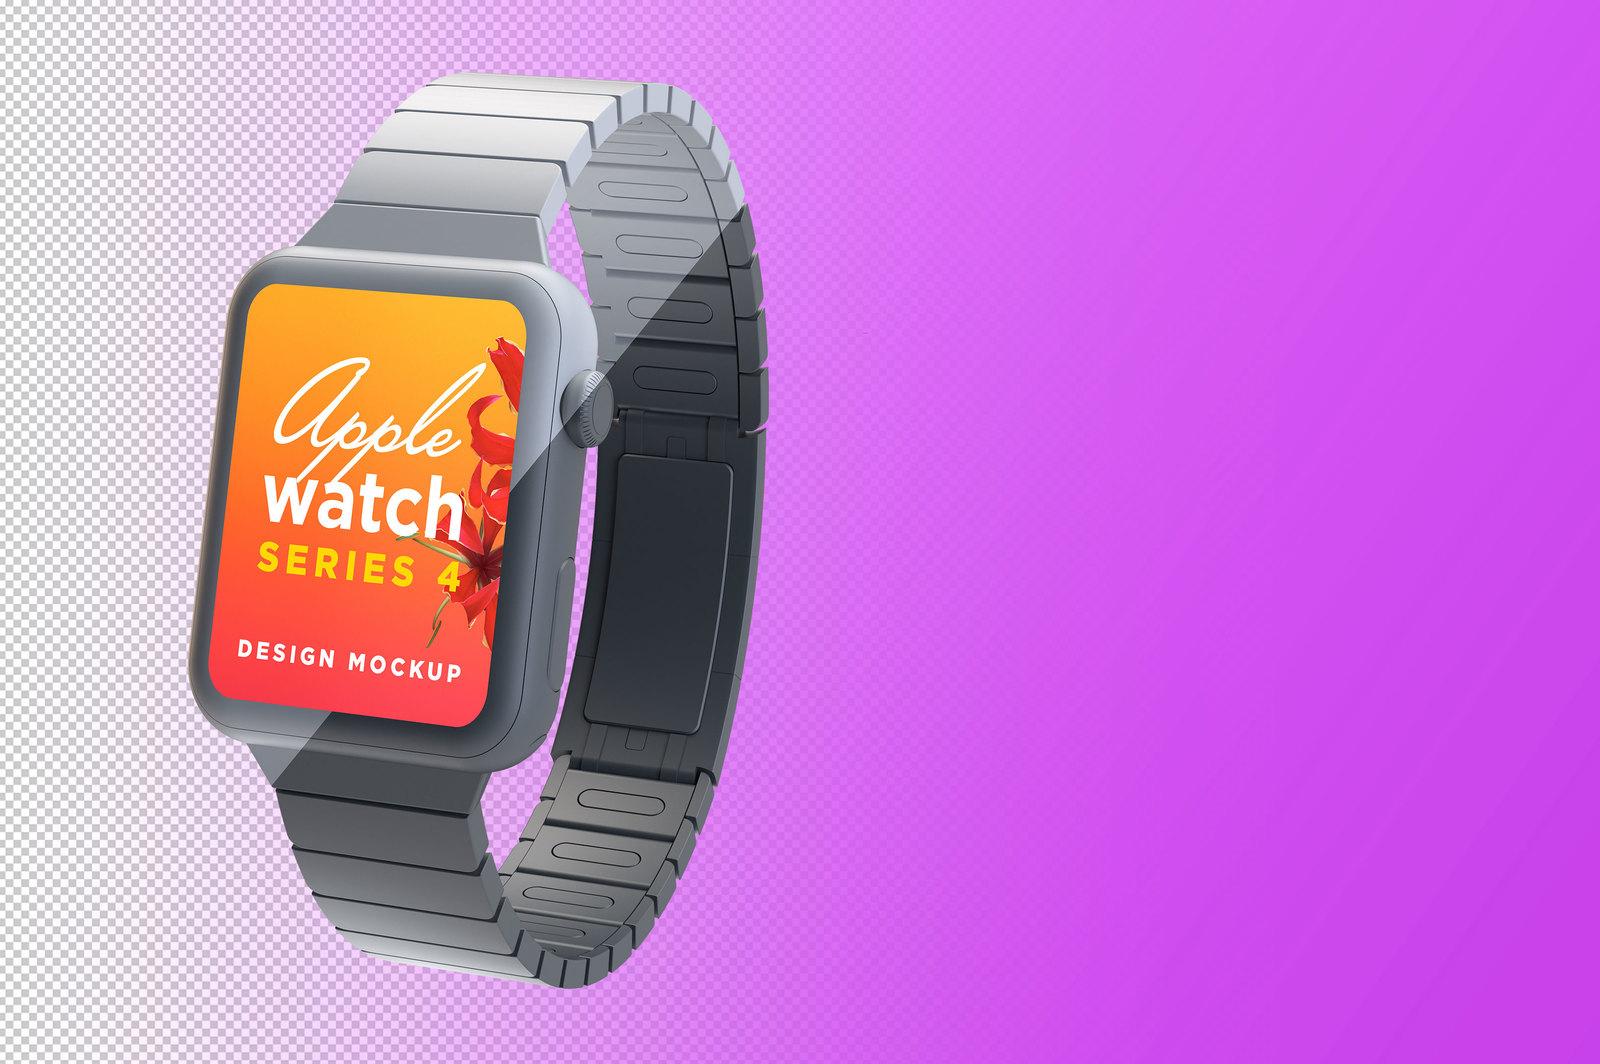 Apple Watch Design Mockups